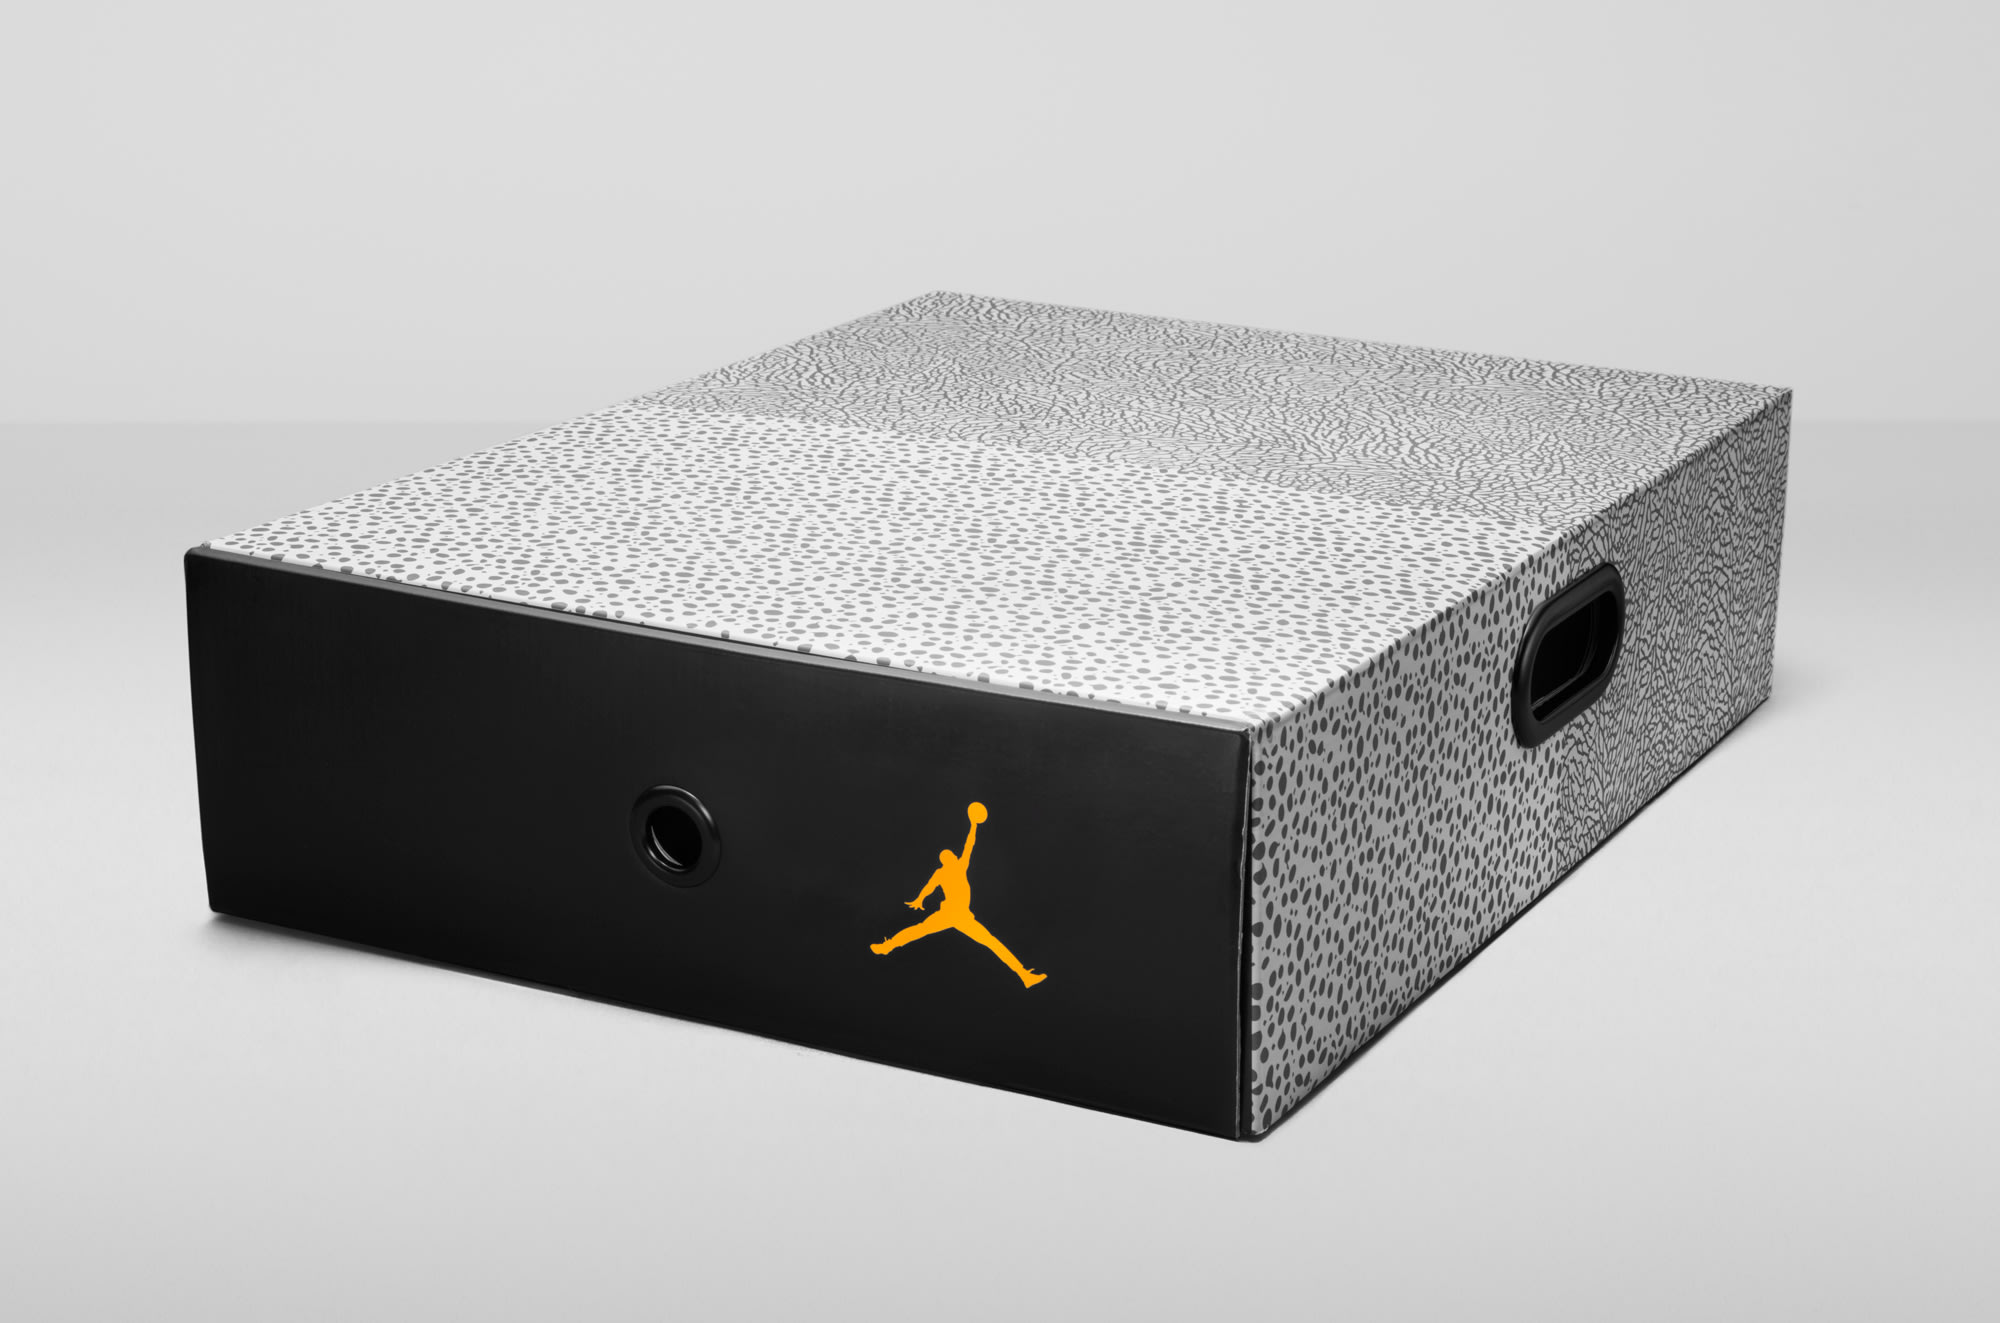 Atmos Air Jordan 3 Air Max Pack Box